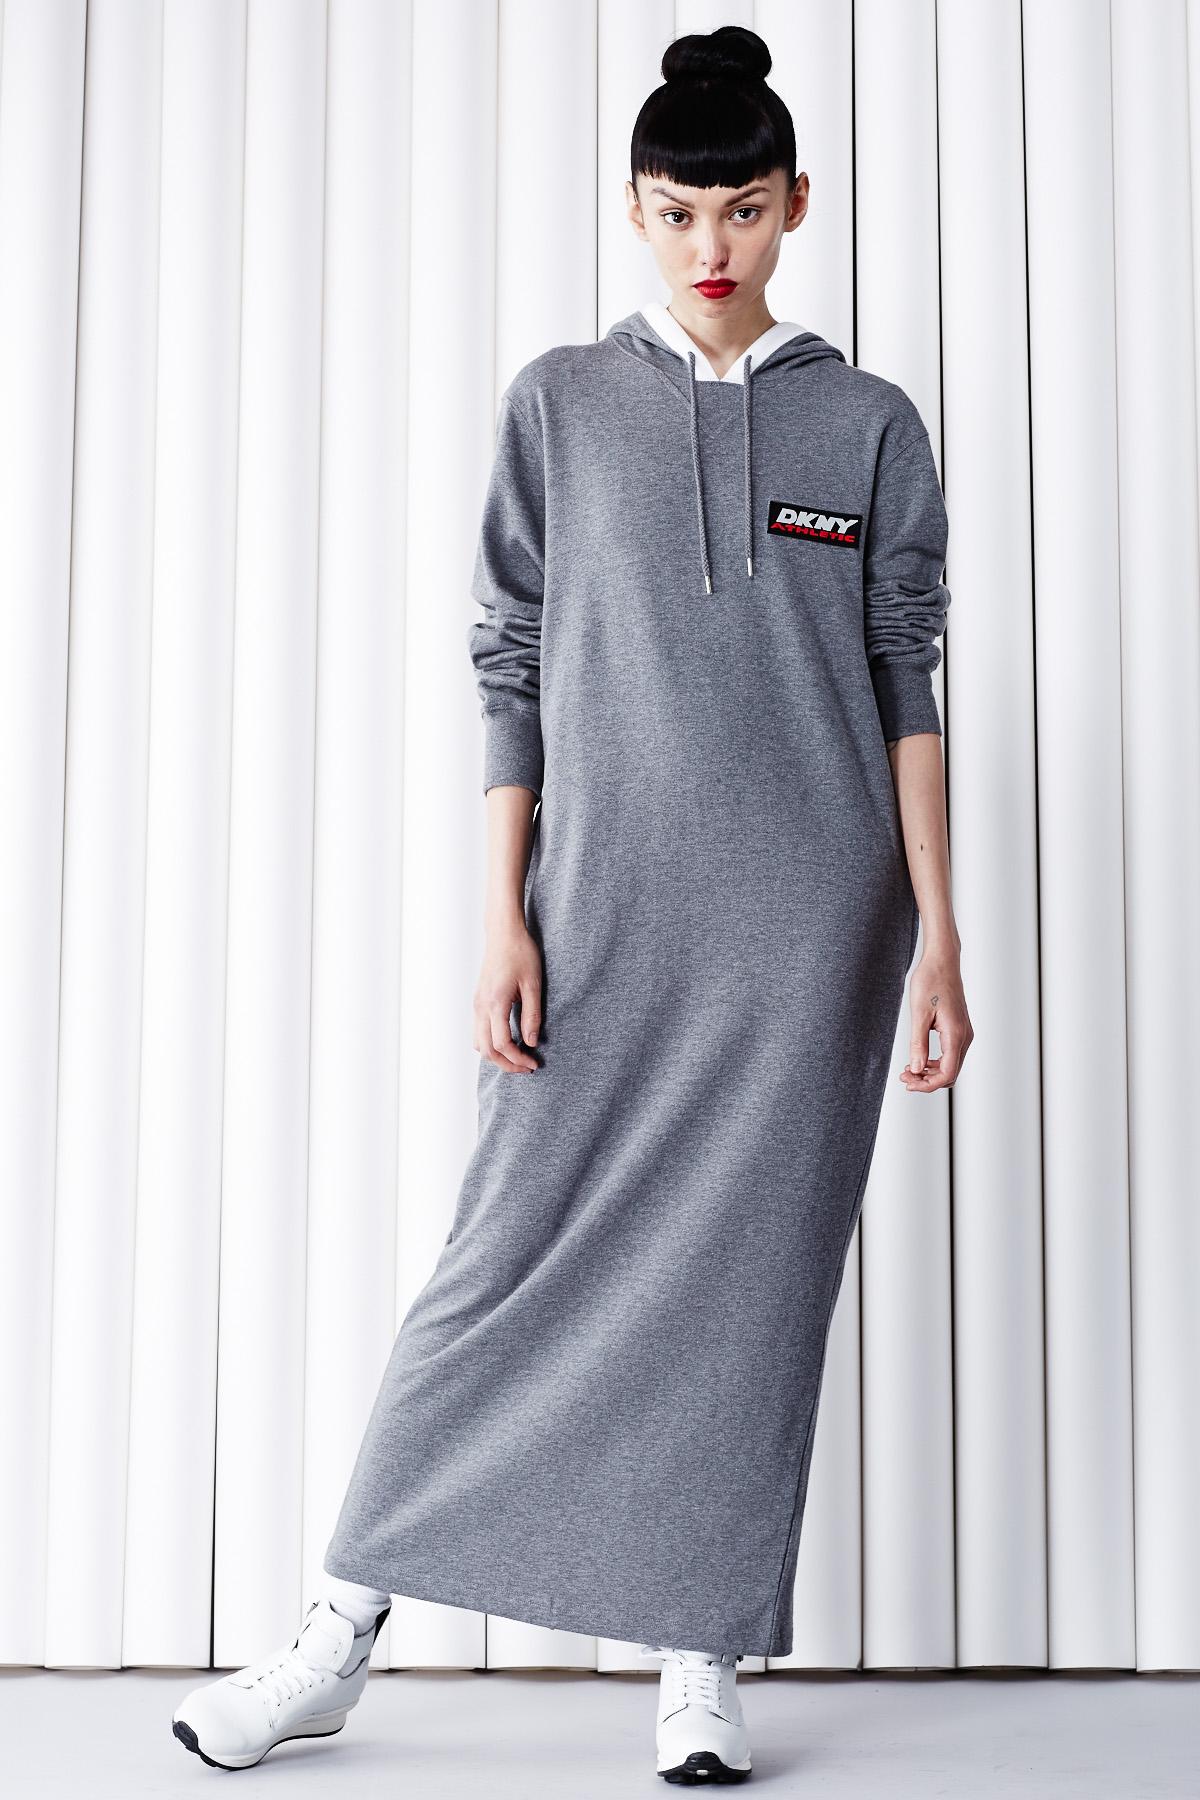 Dkny for opening ceremony dkny athletic tag & logo hooded dress